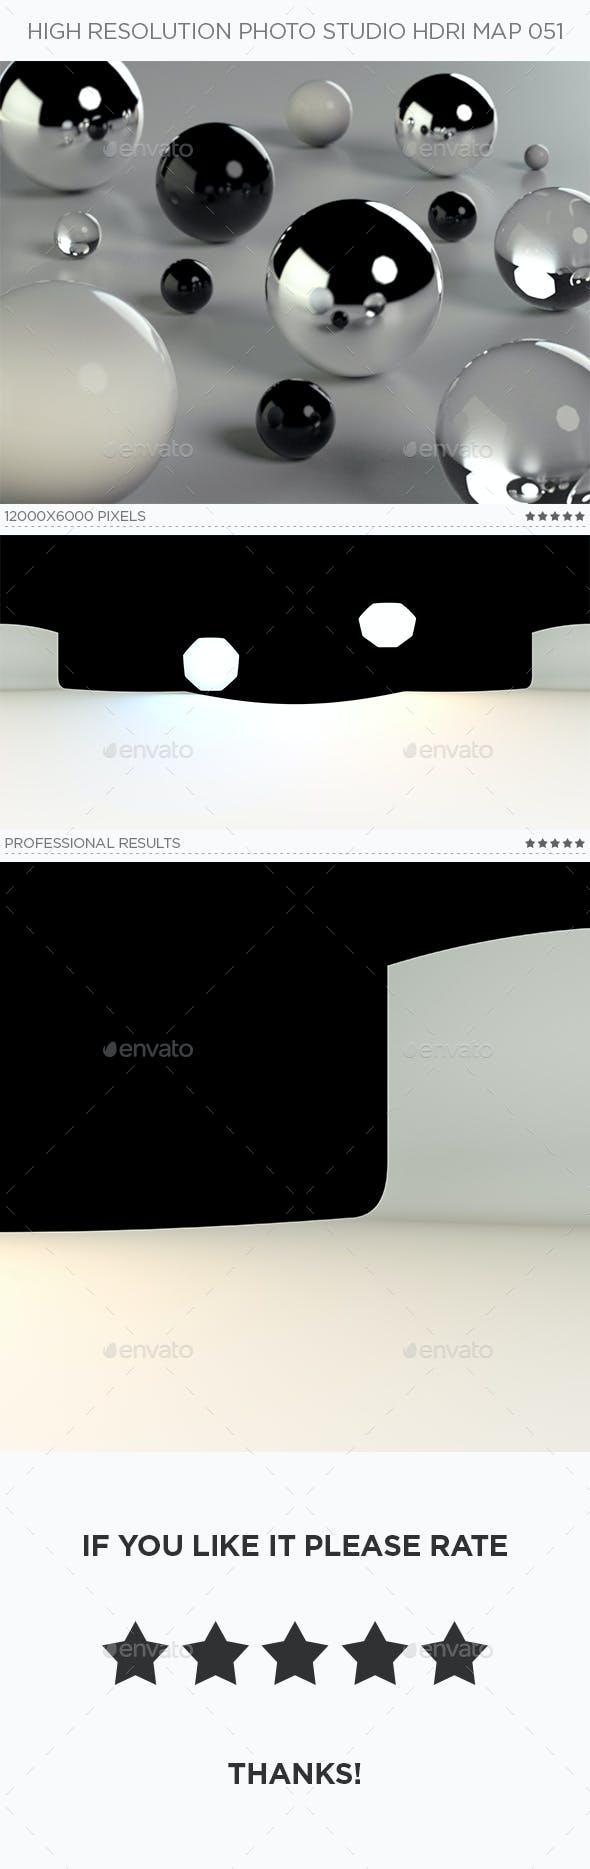 High Resolution Photo Studio HDRi Map 051 - 3DOcean Item for Sale